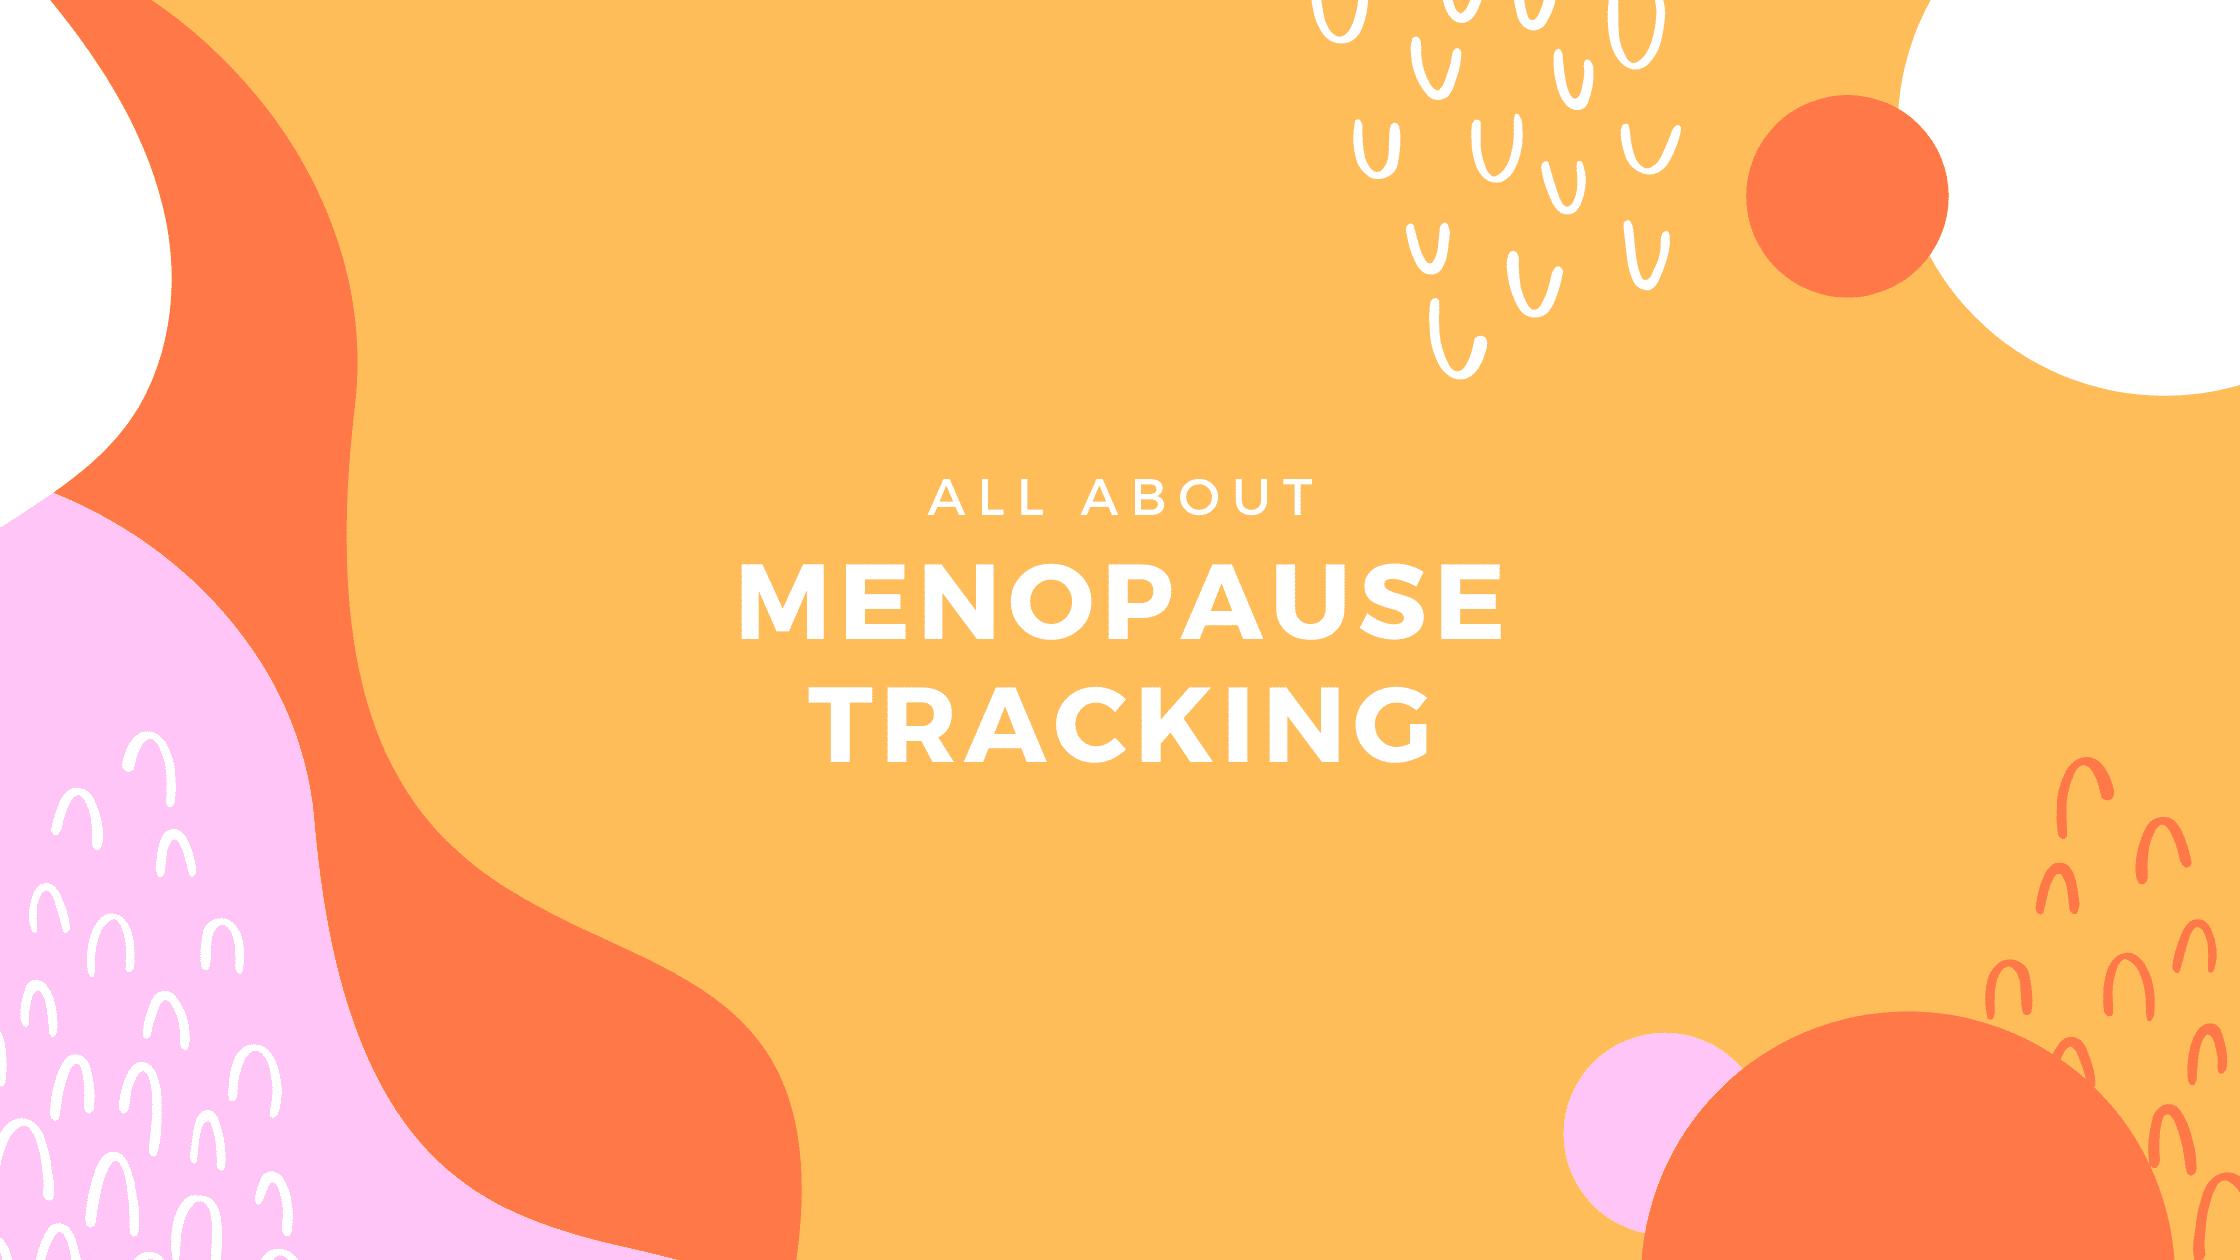 menopause-tracking